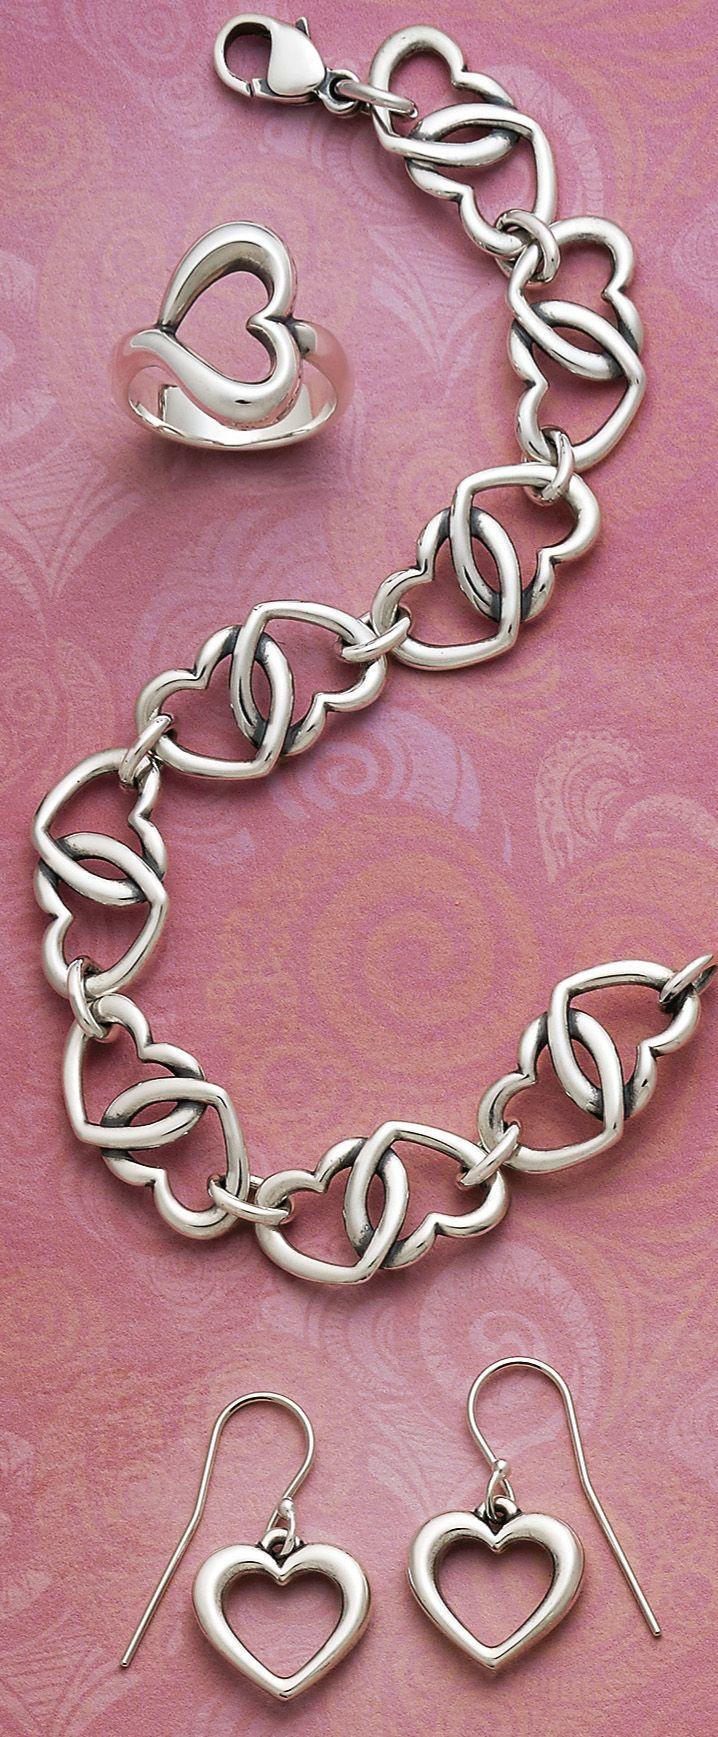 2118 best Jewelry images on Pinterest | Filigree jewelry, Jewelery ...